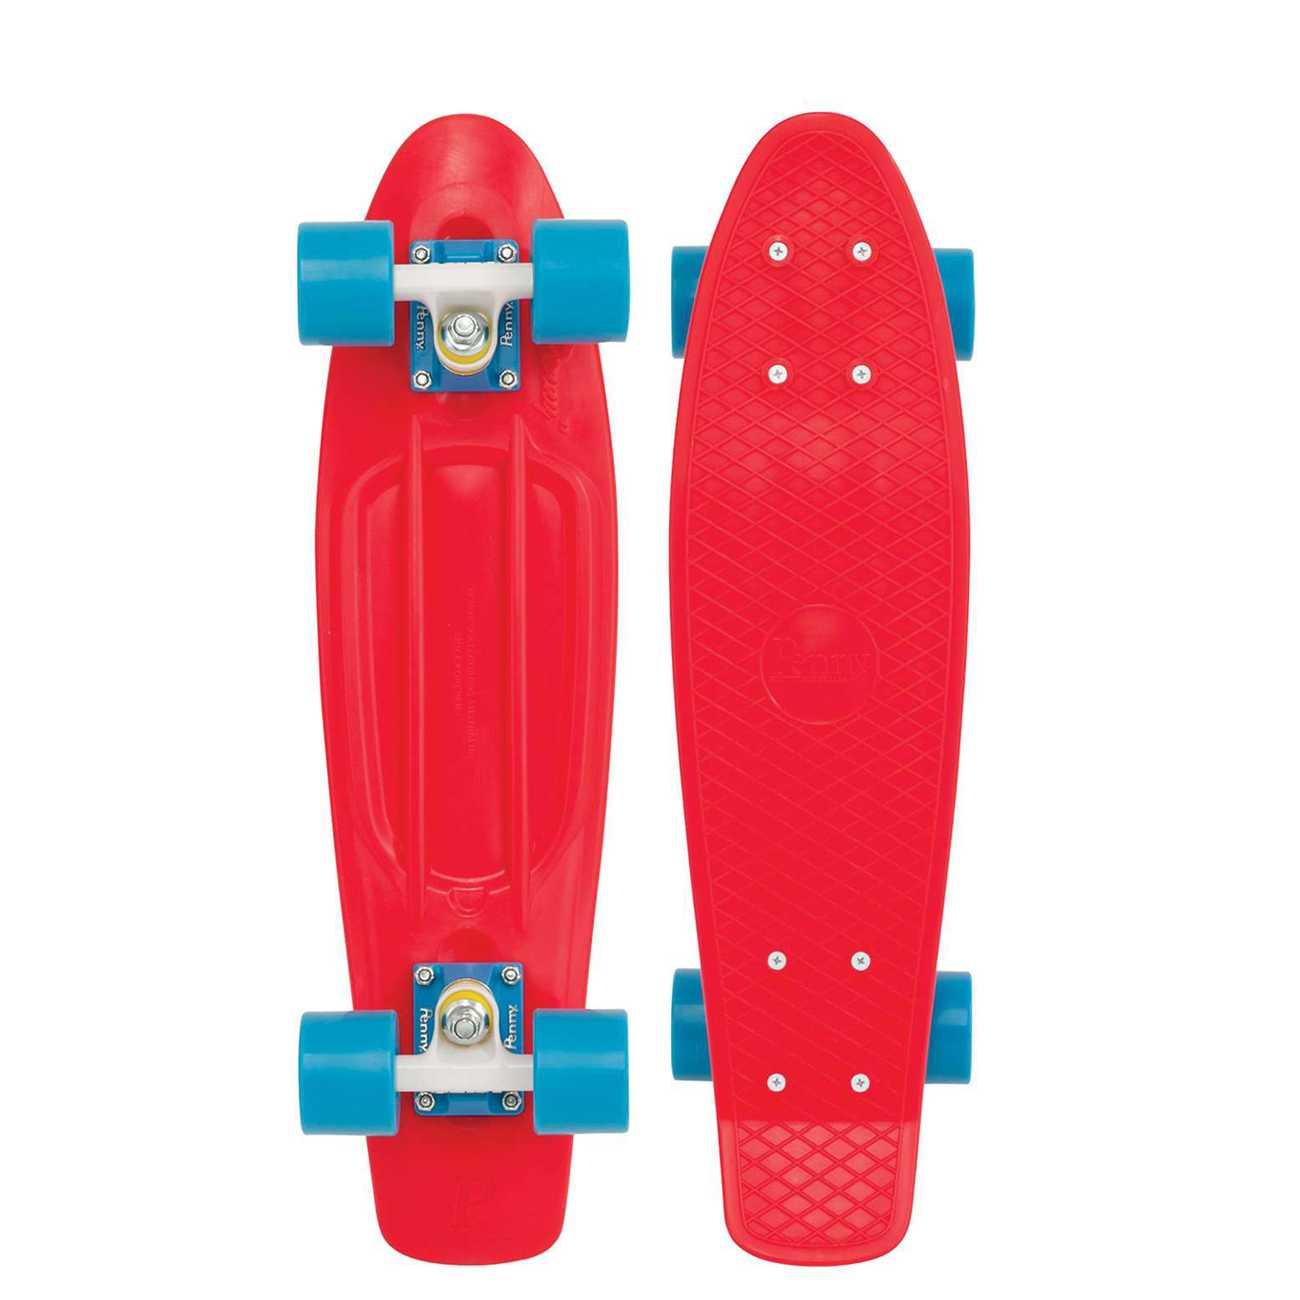 SKATEBOARD RED BLUE 27